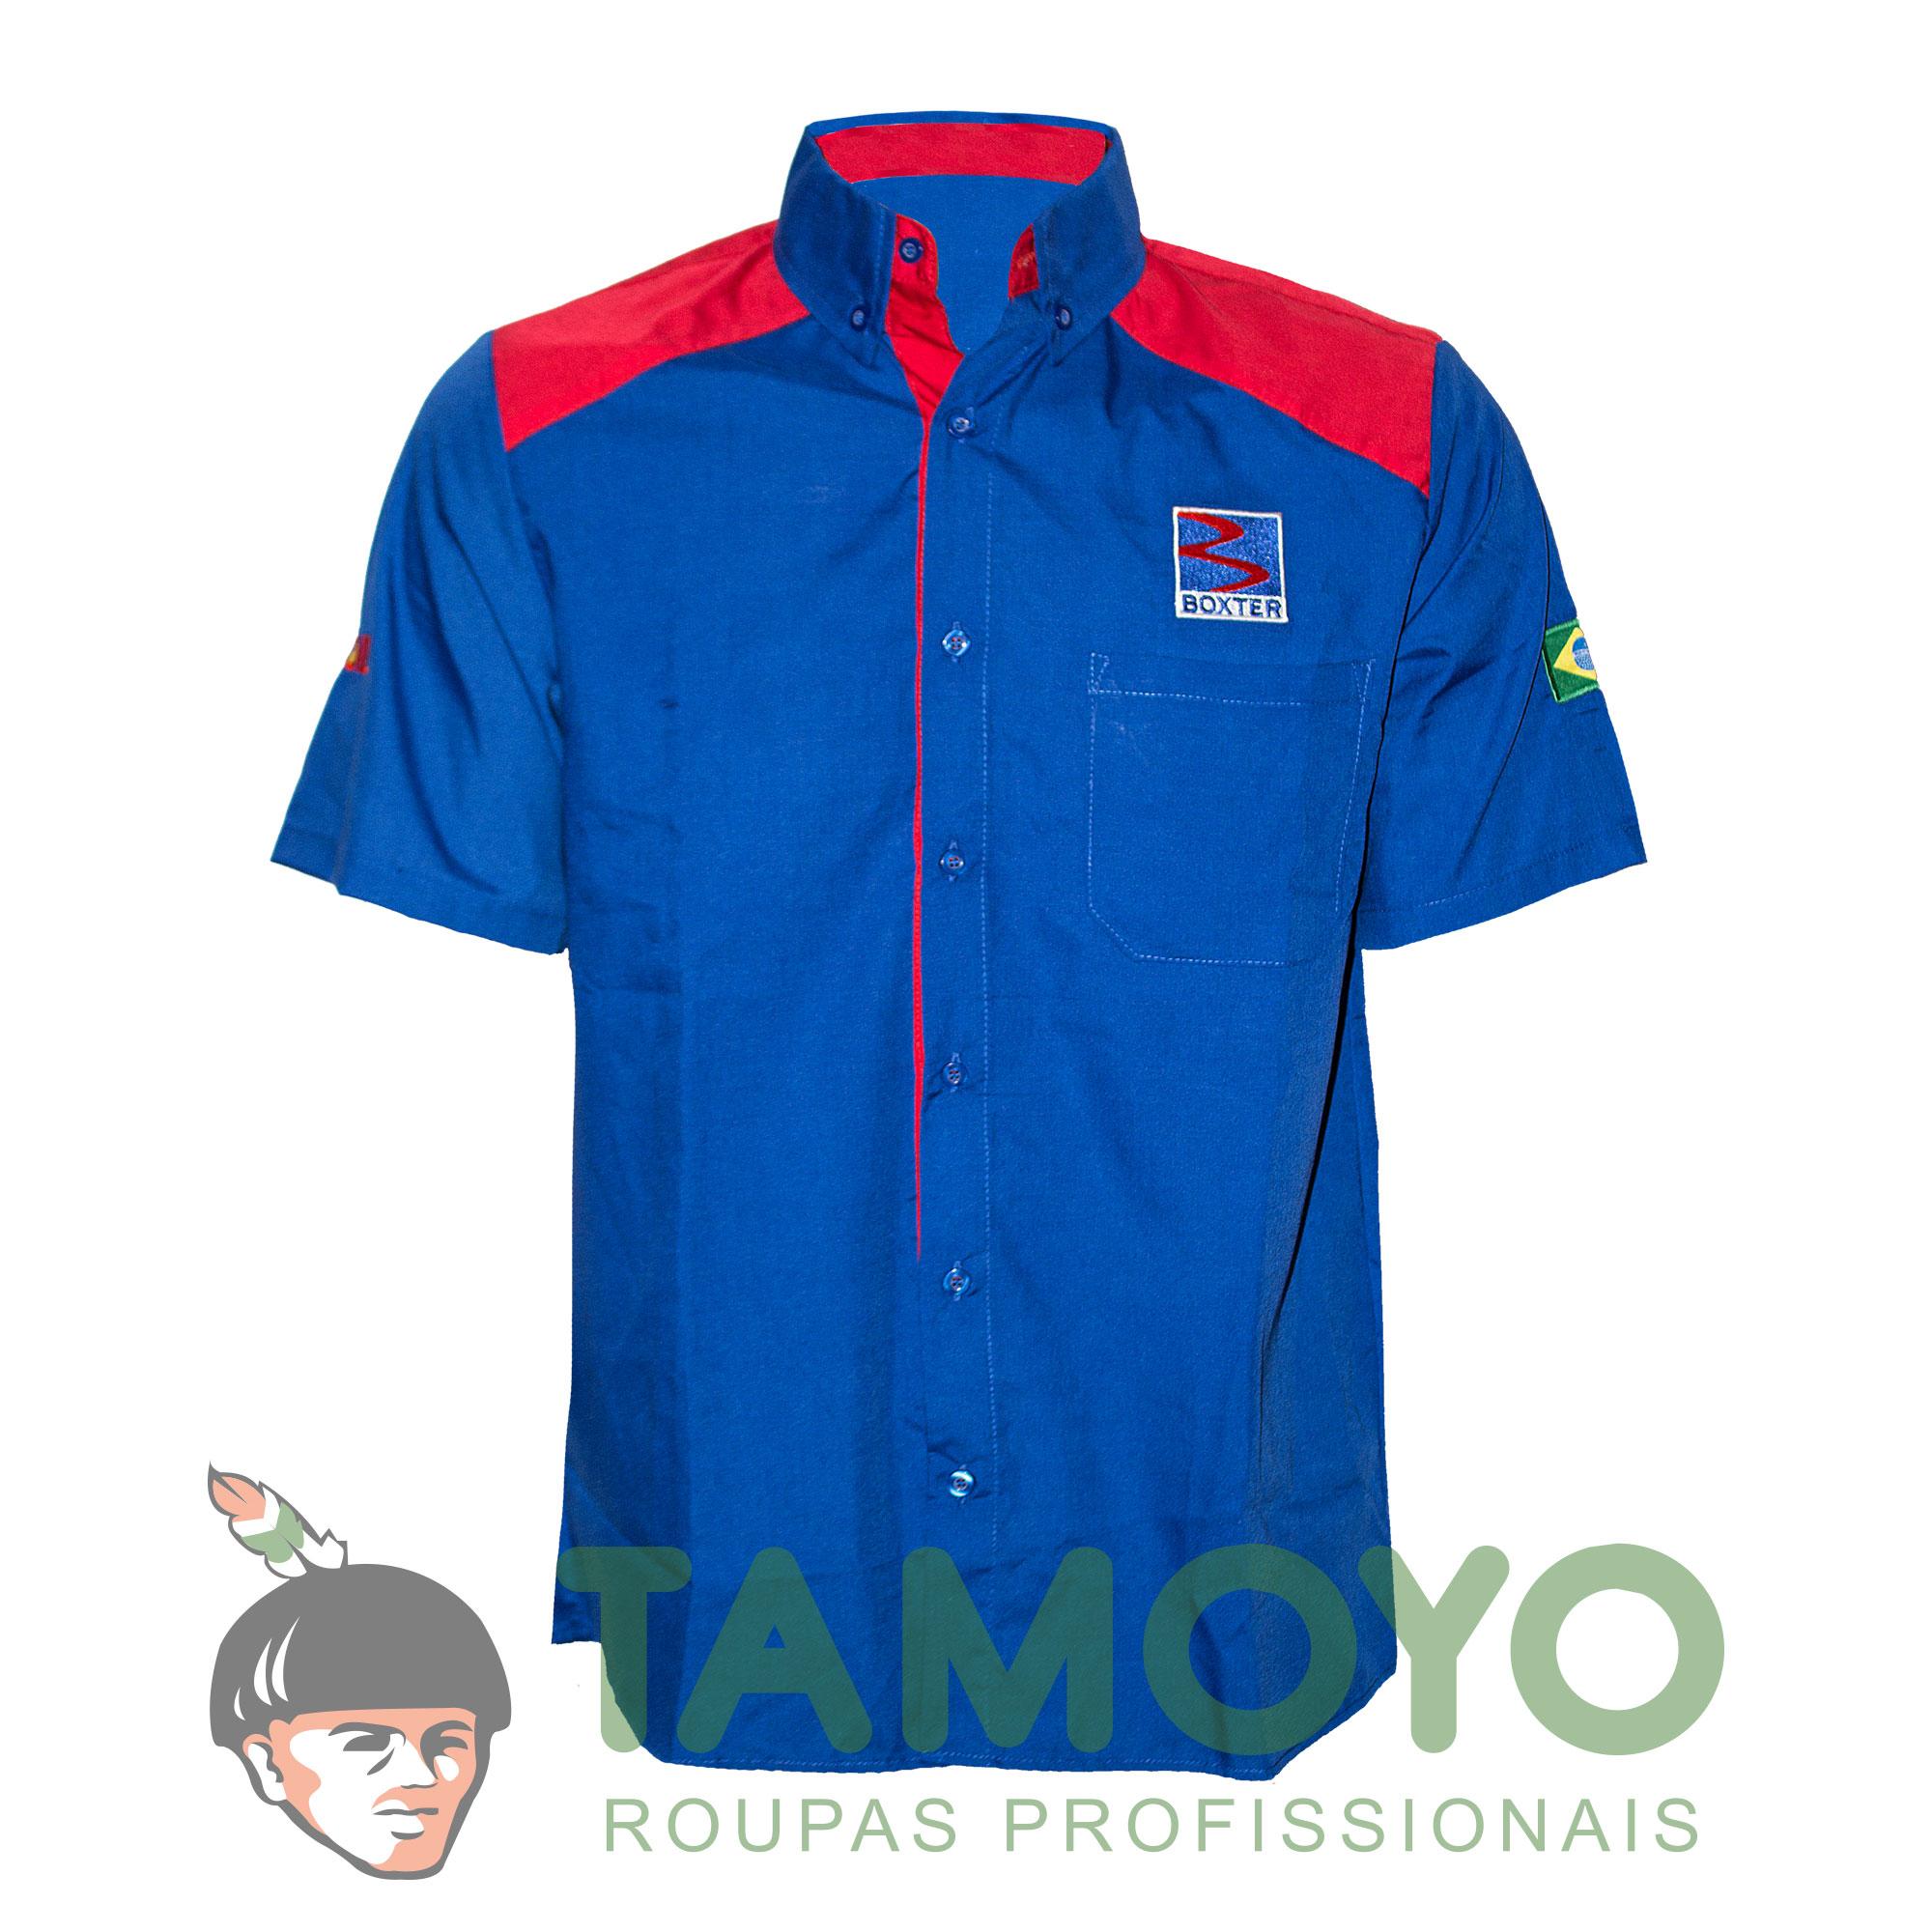 camisa-frentista-masculino-roupas-tamoyo-uniformes-profissionais-f